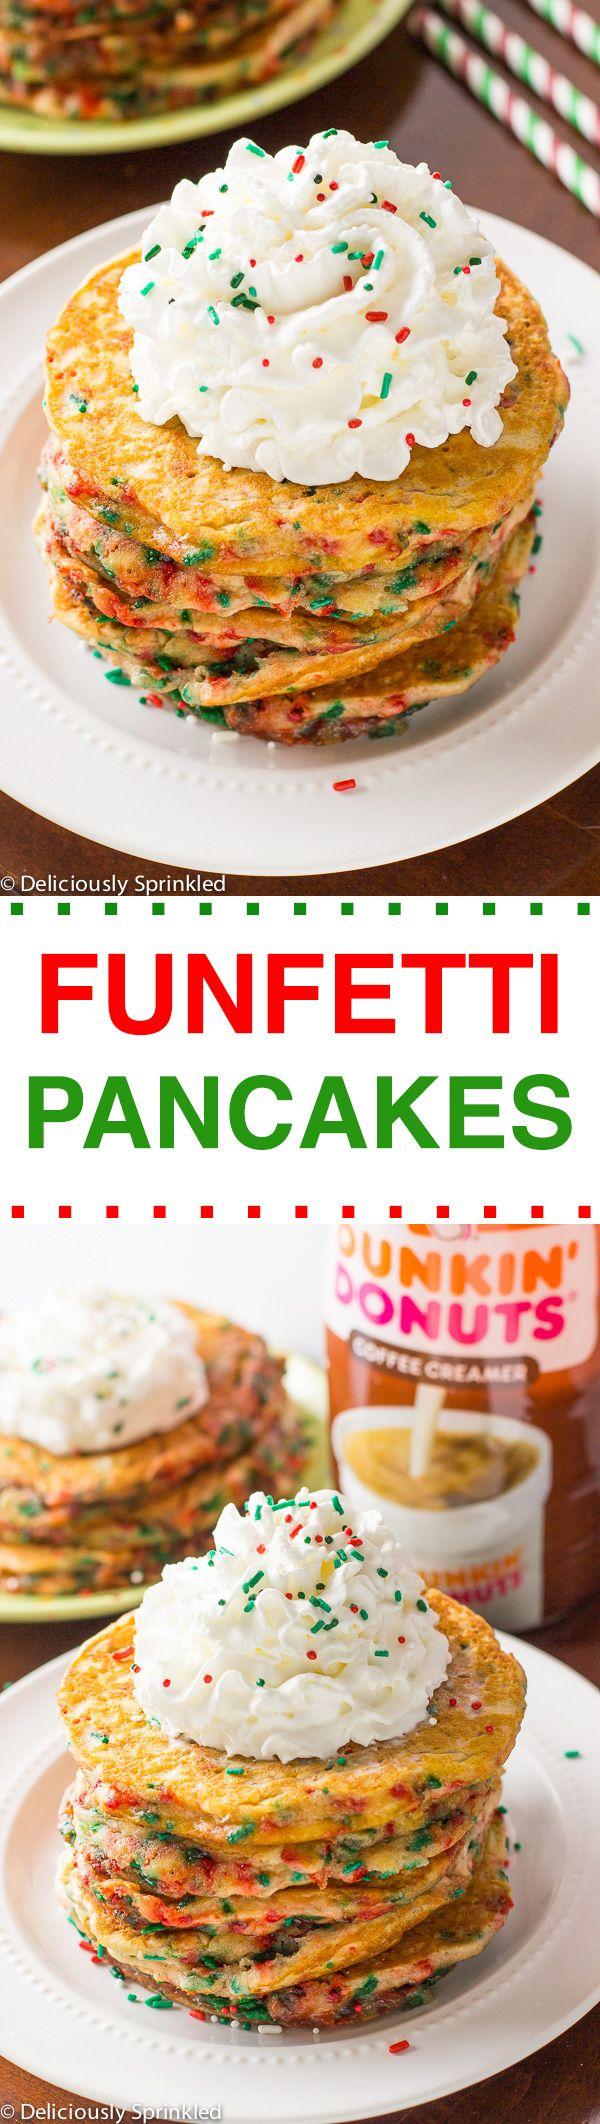 Funfetti Pancakes | Recipe | The o'jays and Pancakes